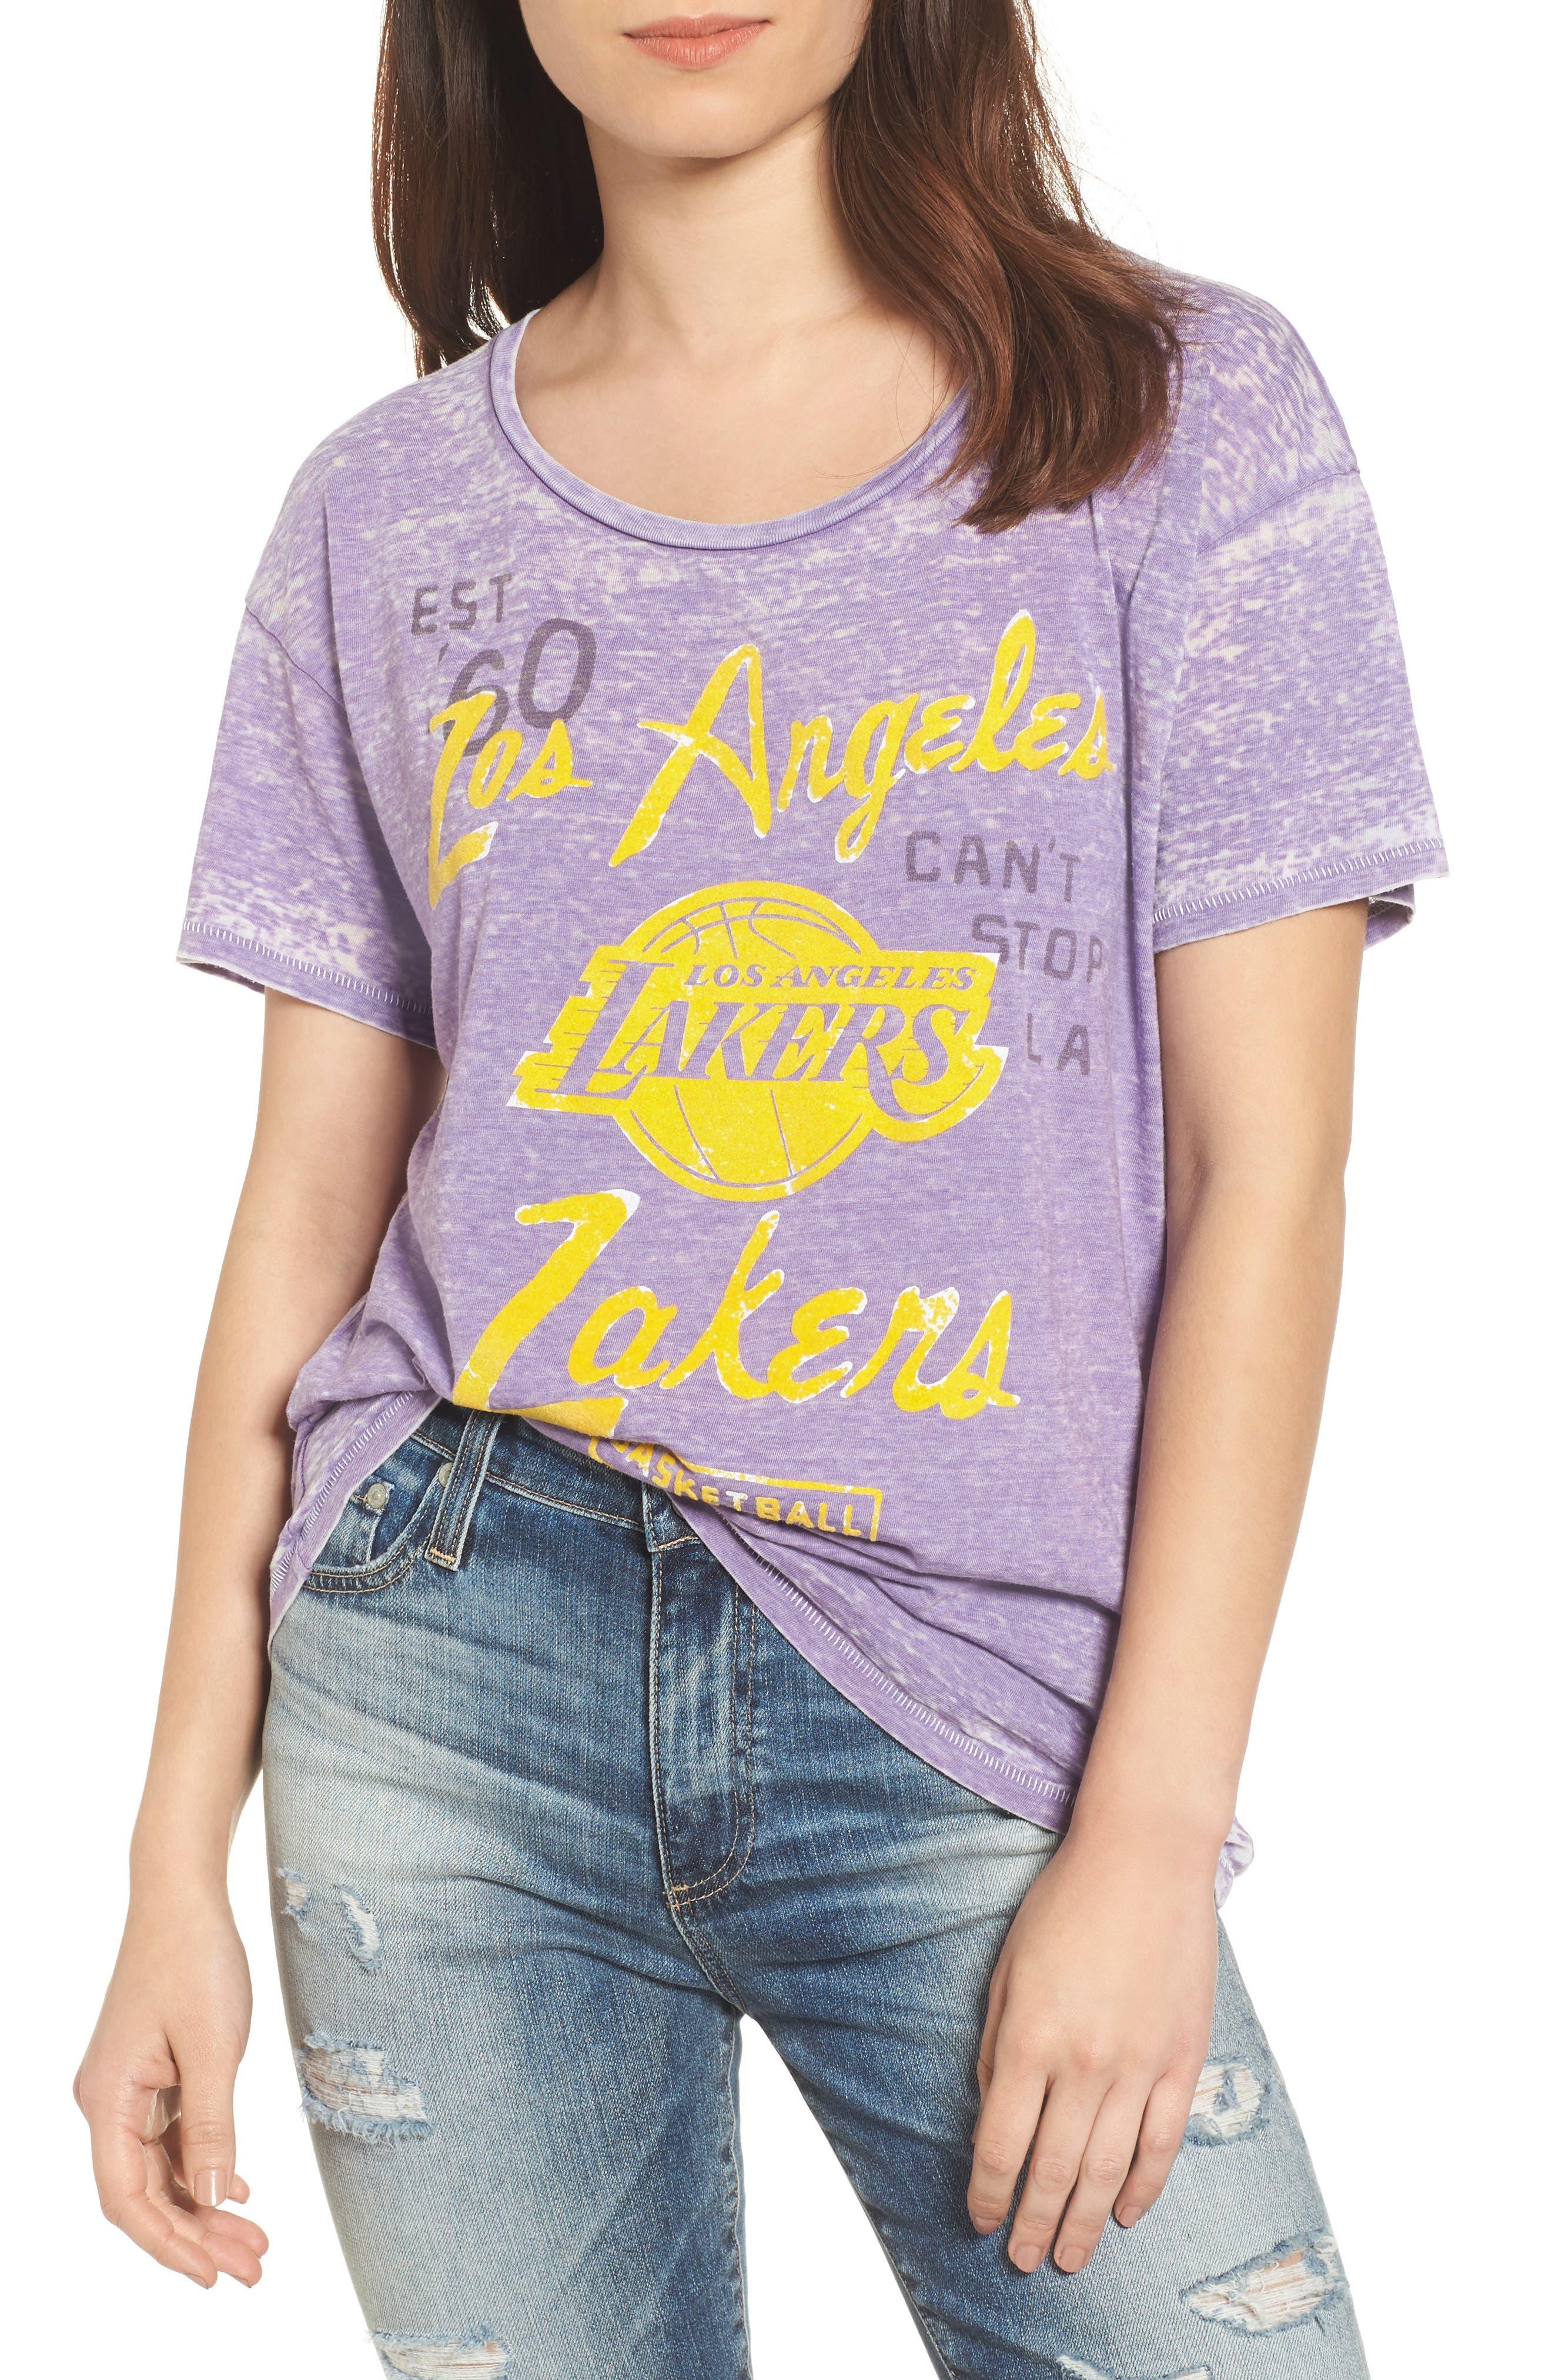 NBA Los Angeles Lakers Tee,                             Main thumbnail 1, color,                             Plum